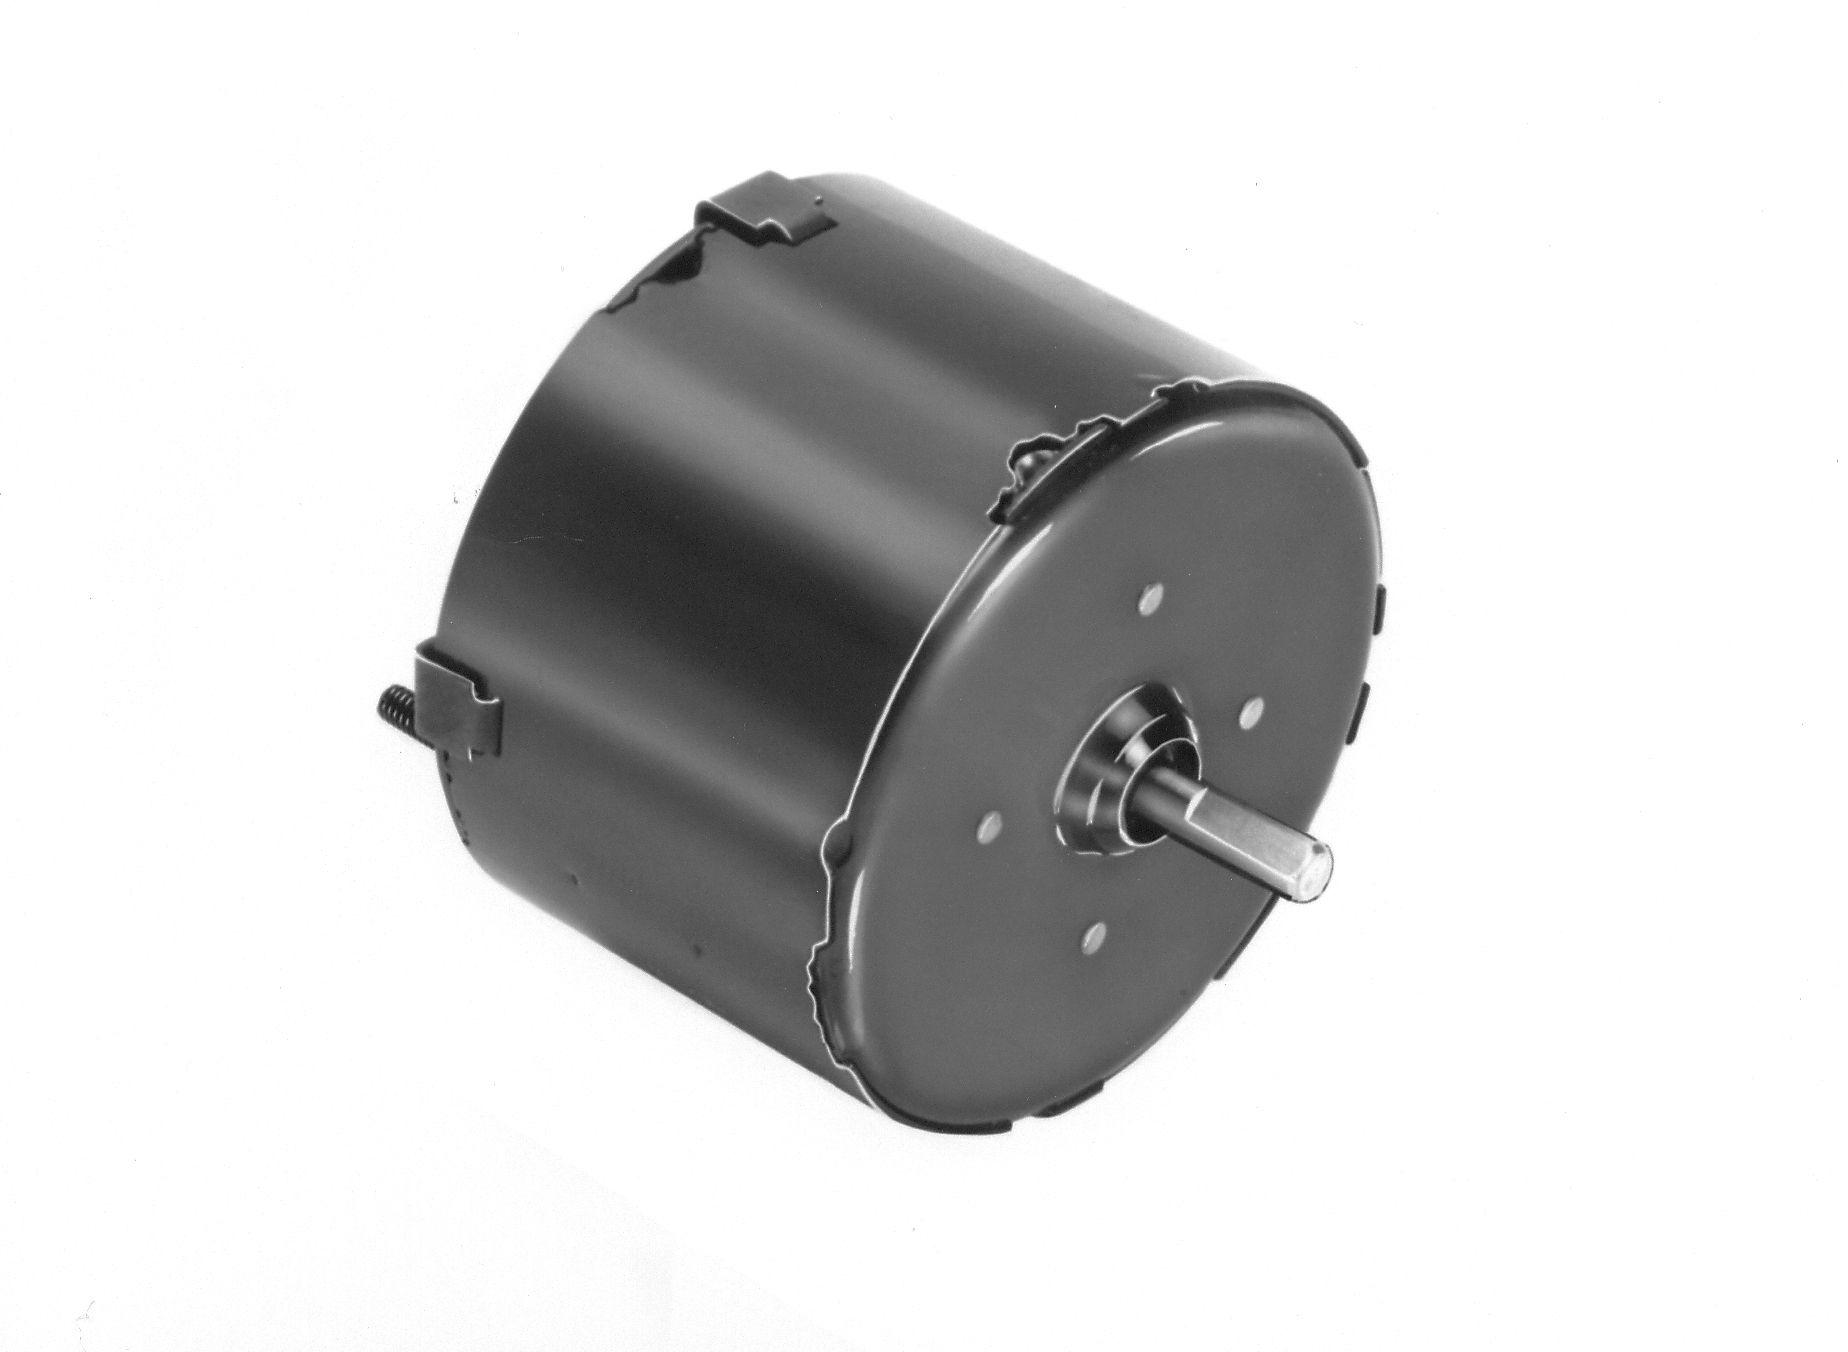 Fasco Industries Bathroom Exhaust Fans Model Bathroom Ideas - Fasco bathroom exhaust fan for bathroom decor ideas